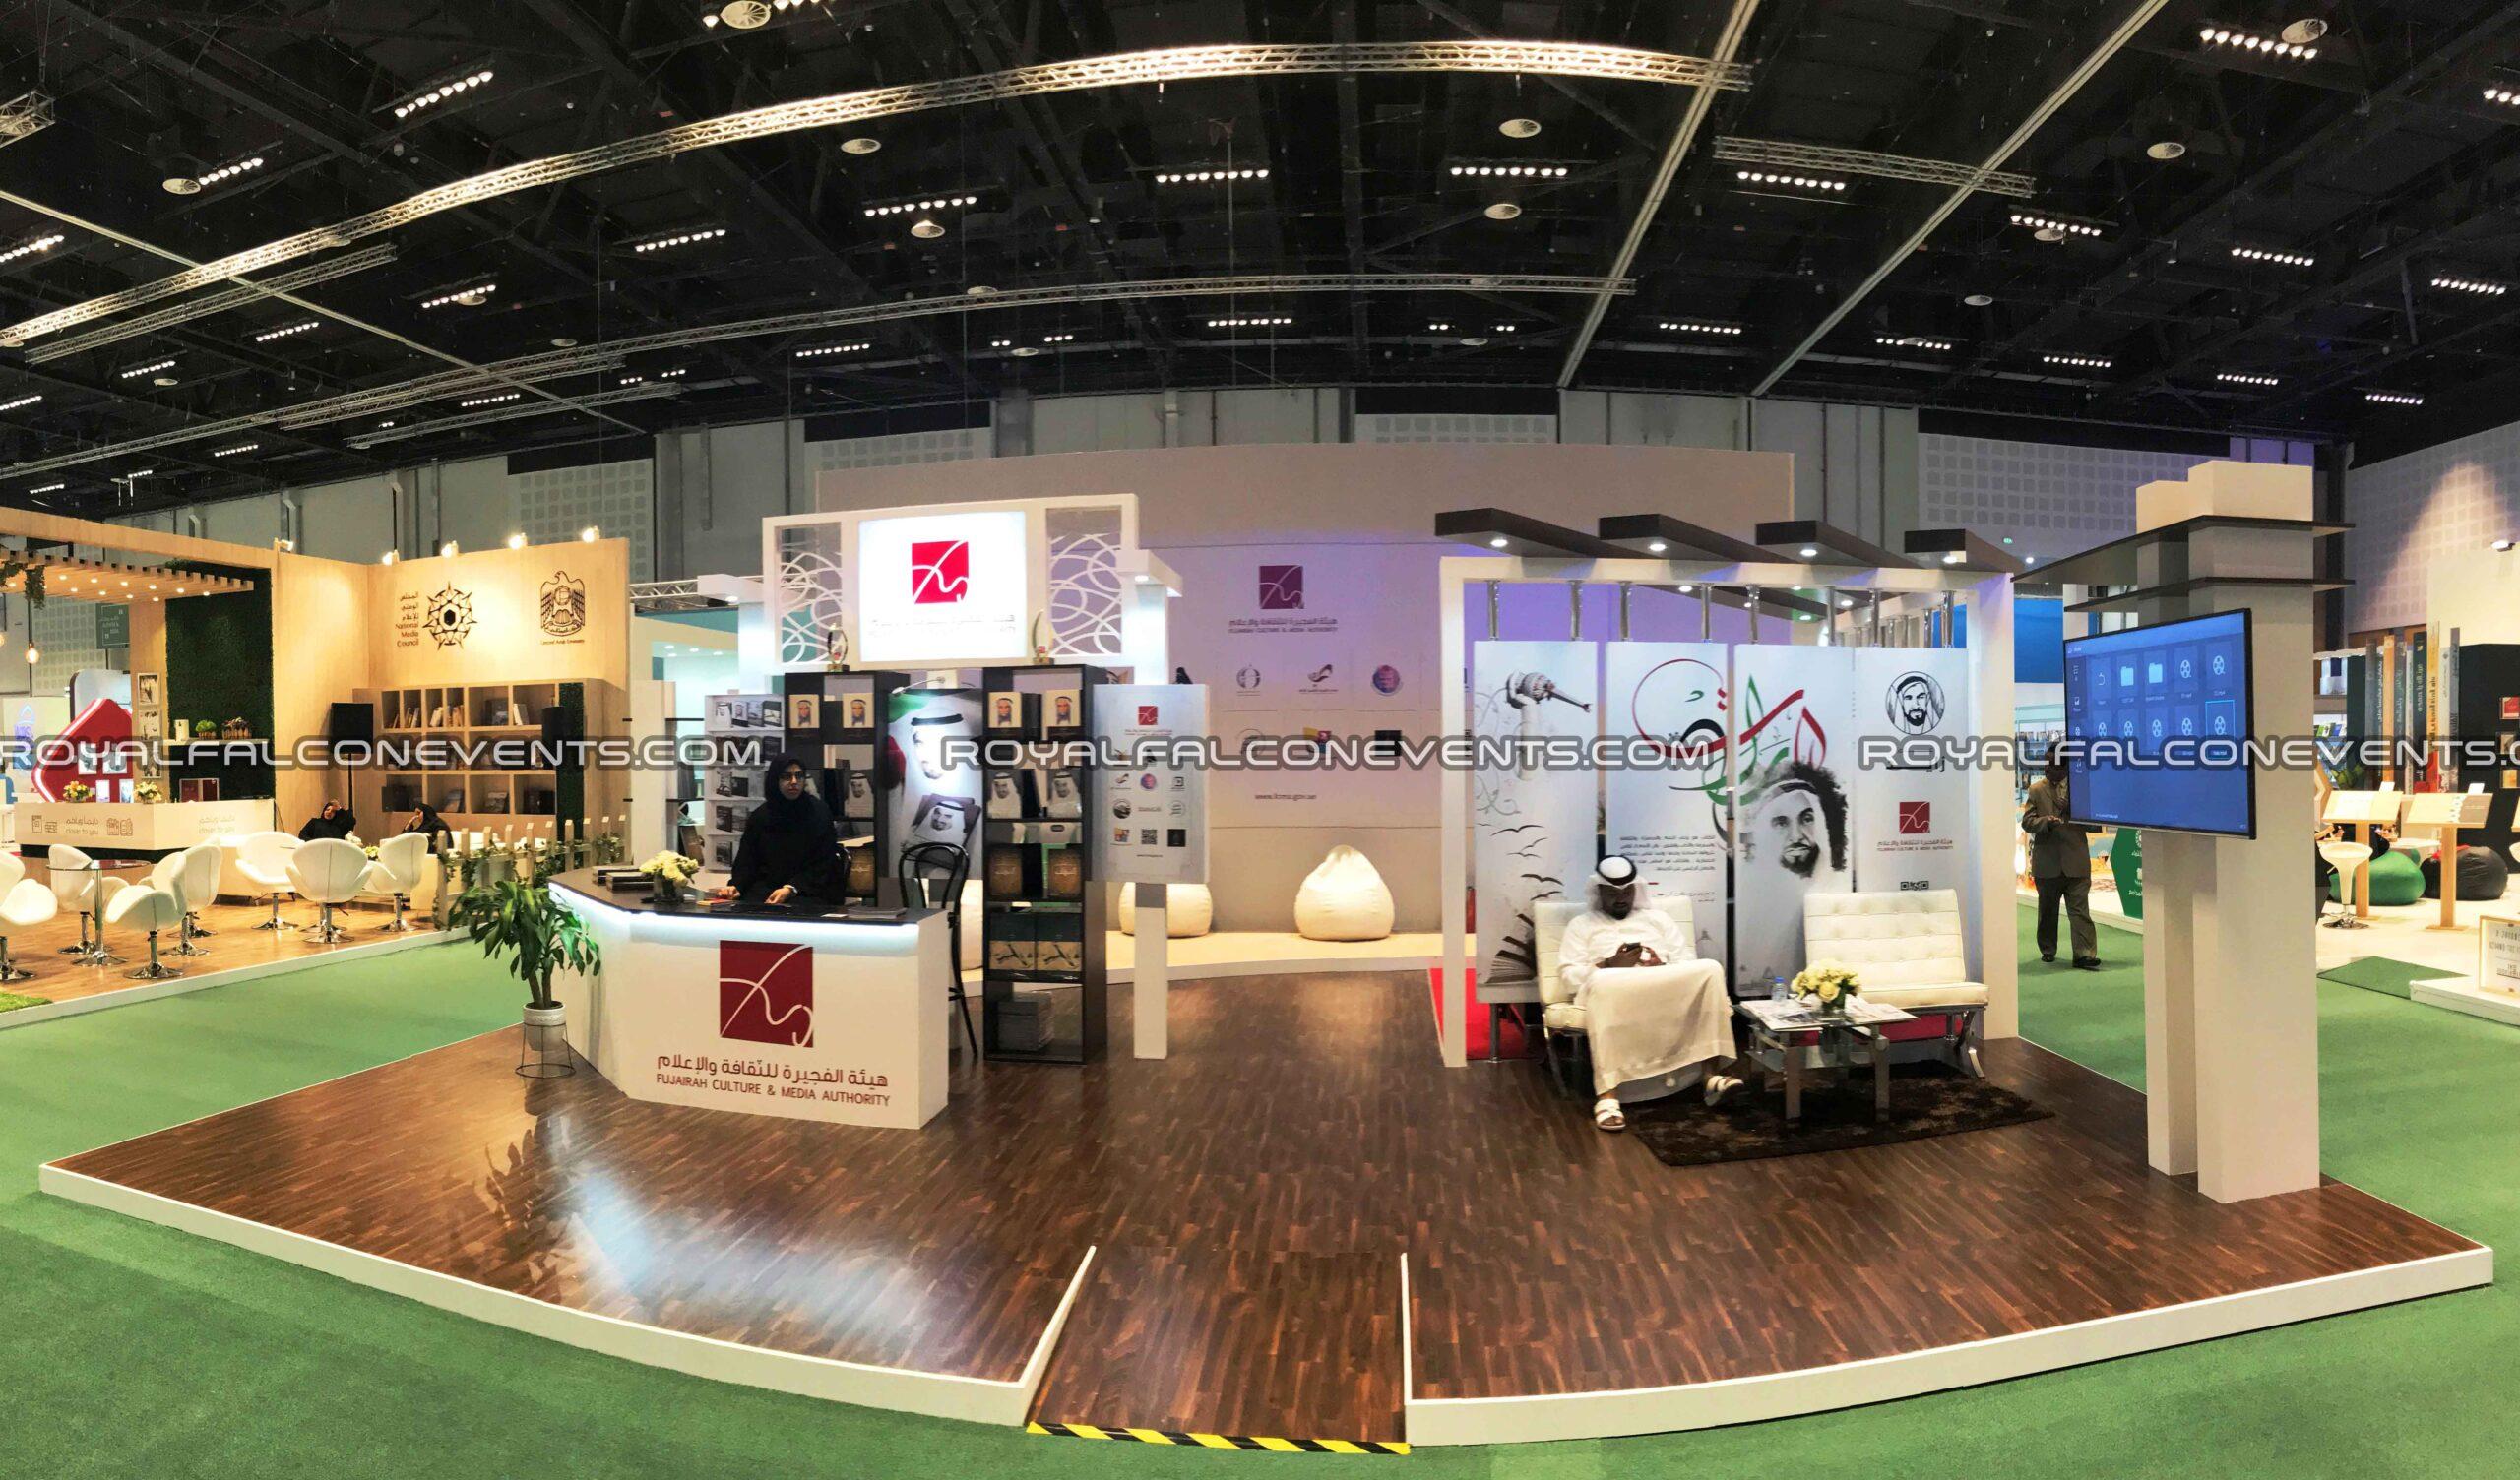 Exhibition Stand Makers In Dubai : Exhibition stand builders in dubai royal falcon events